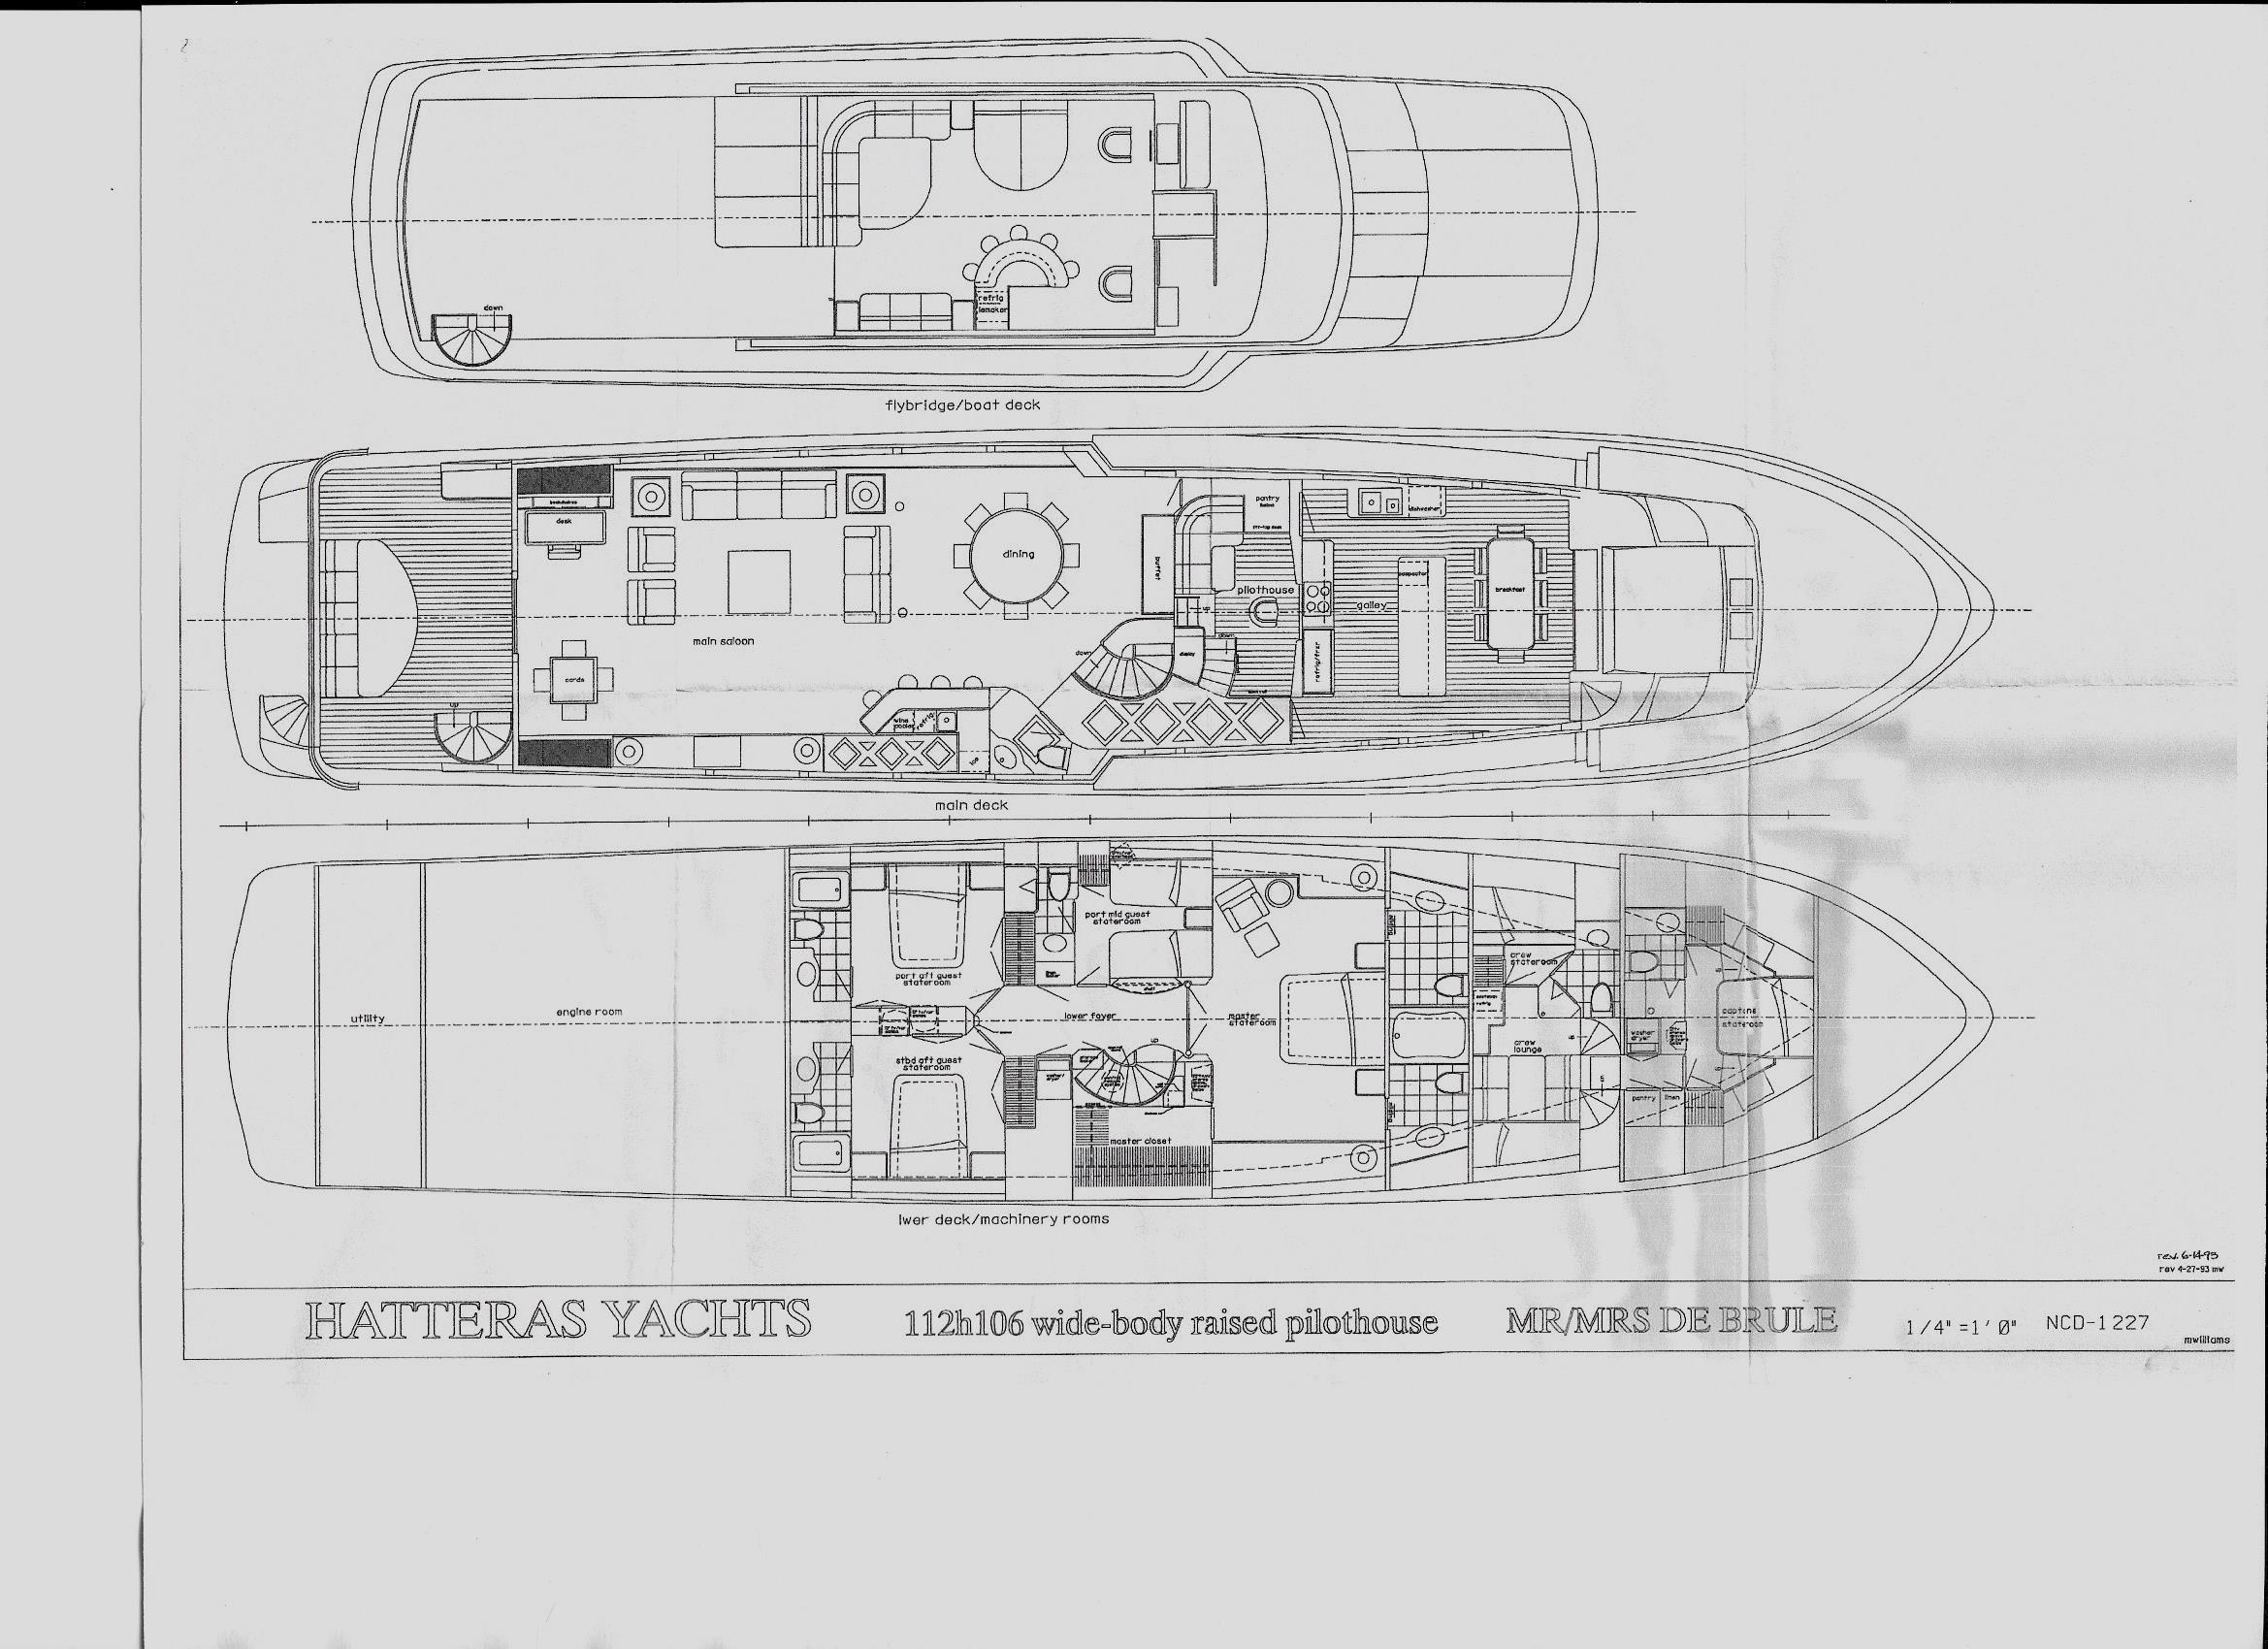 4726998_20150716113049487_1_XLARGE lady monroe 114 hatteras 1994 biloxi, mississippi Hatteras Sportfish 45C at readyjetset.co